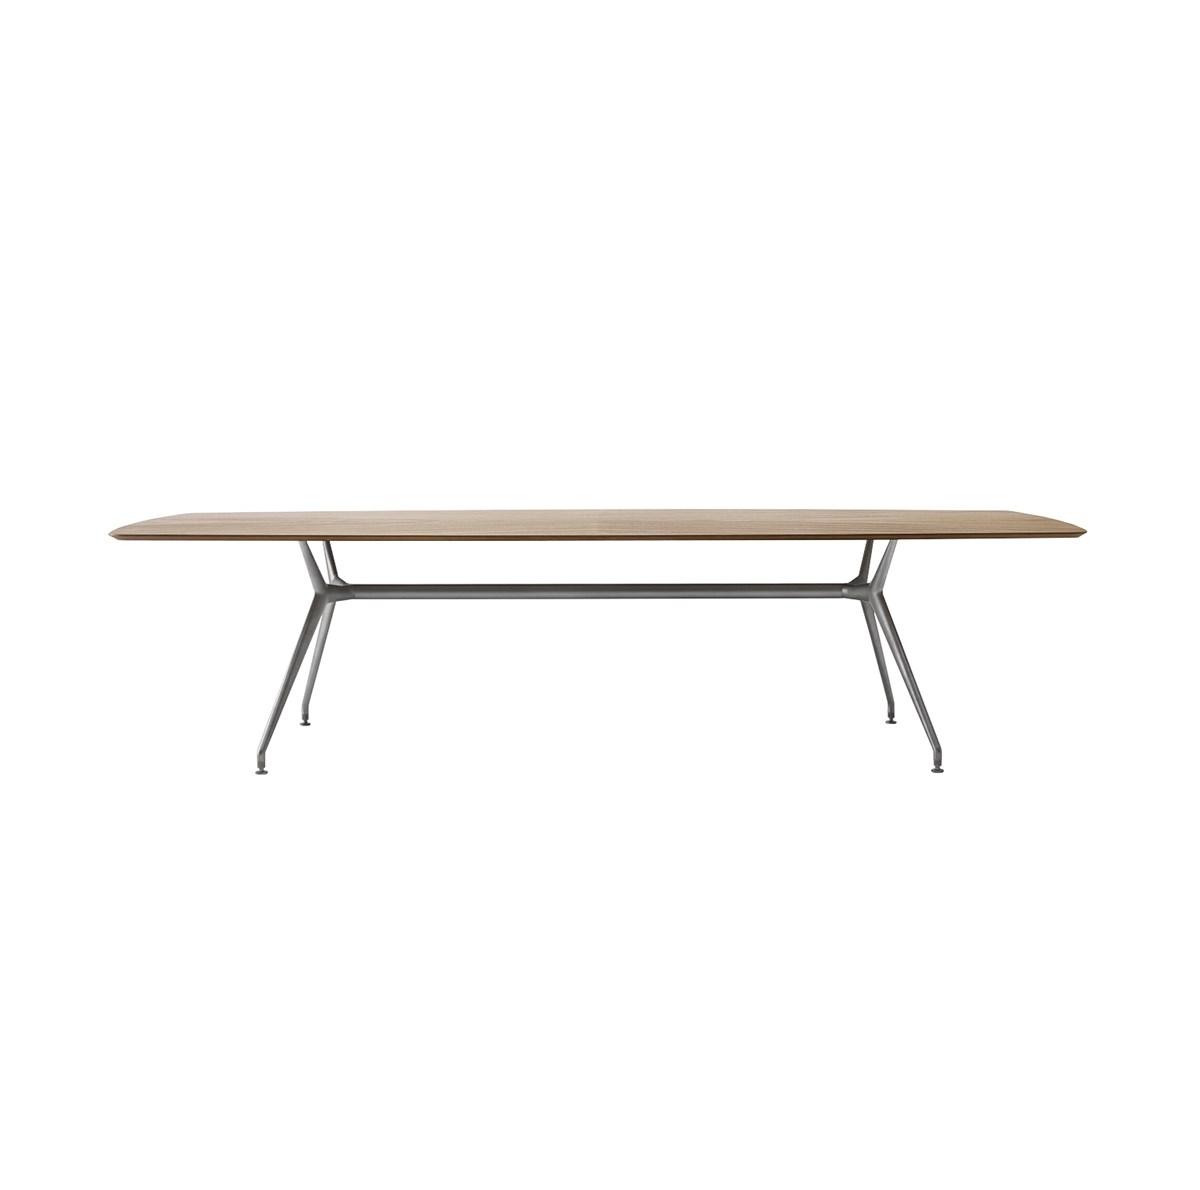 Rimadesio-Giuseppe-Bavuso-Manta-Table-Matisse-1